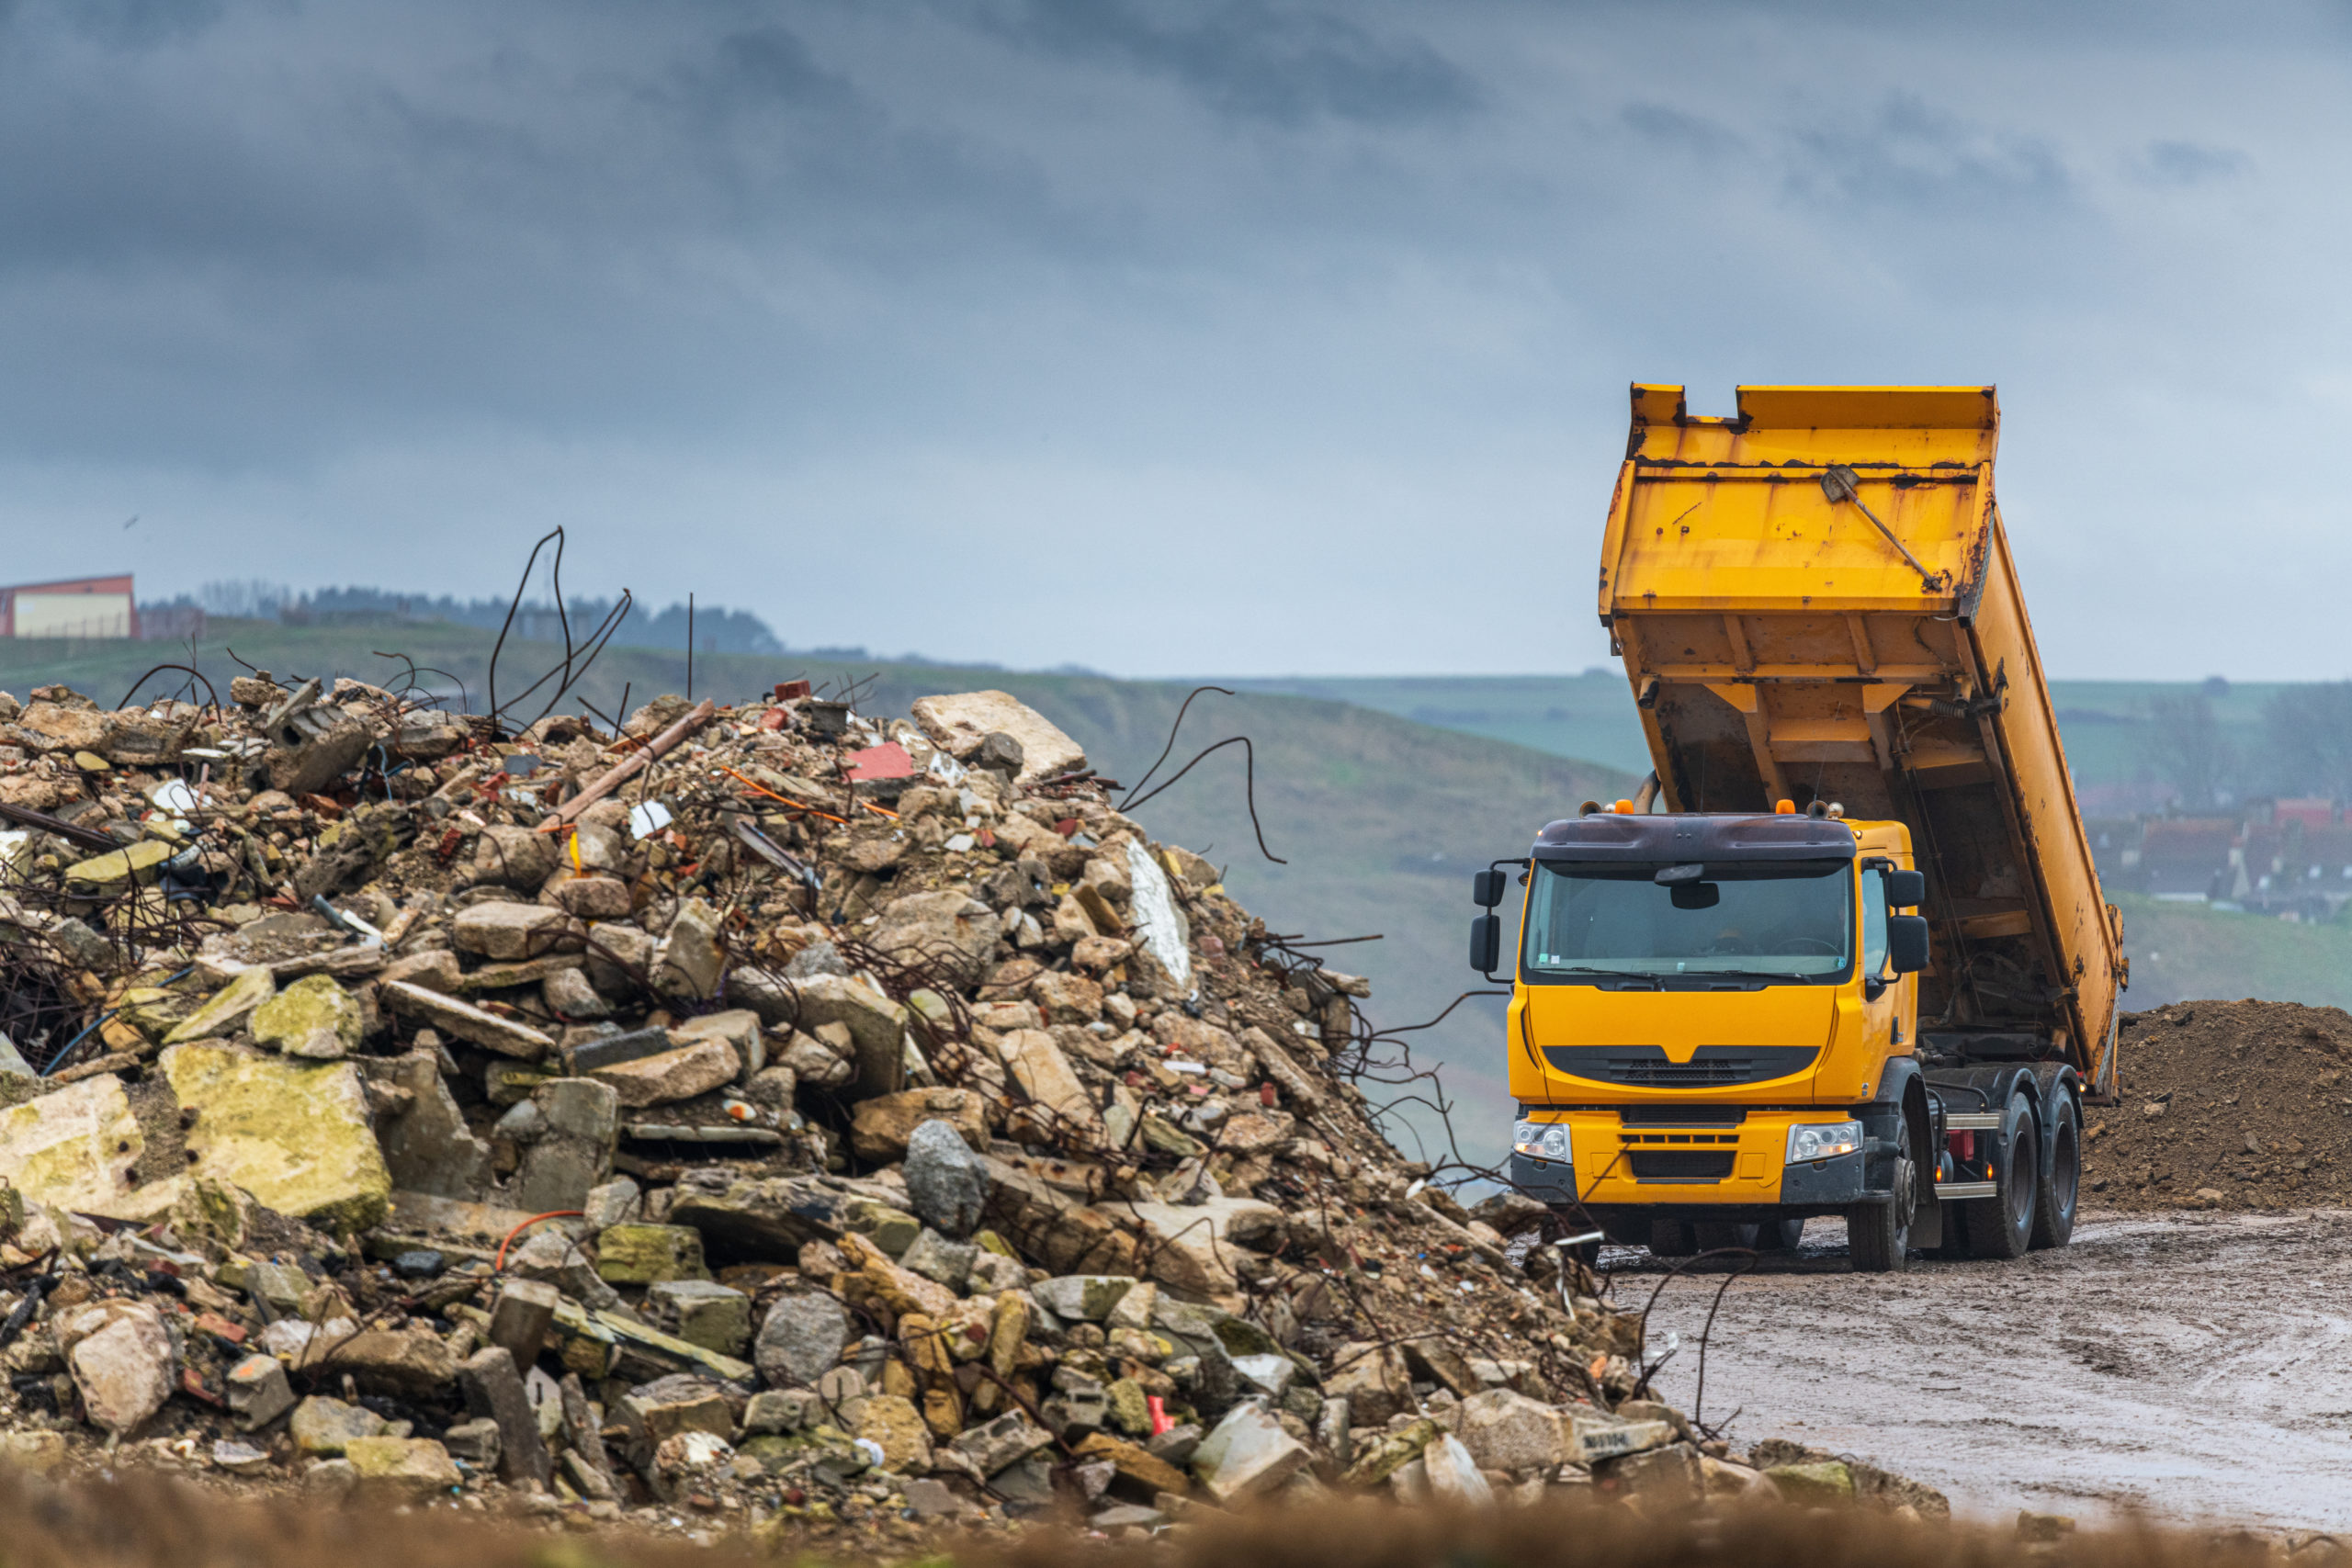 産業廃棄物収集運搬業の許可申請